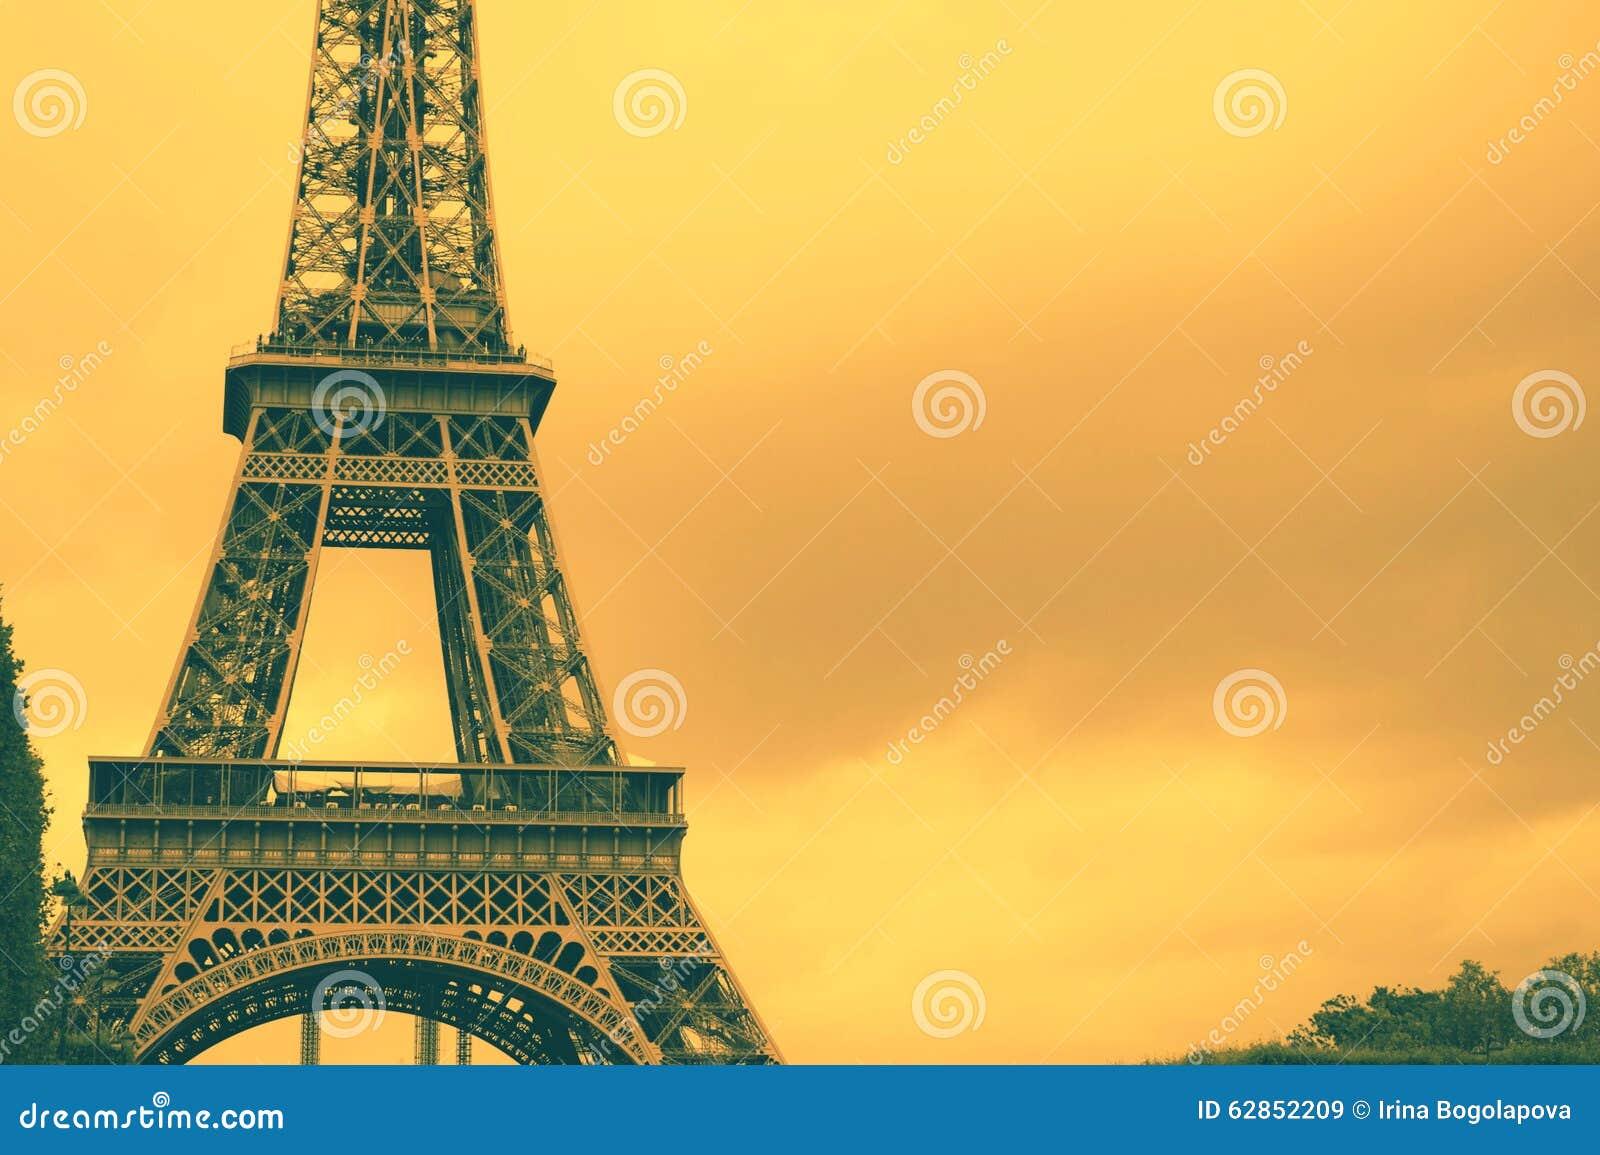 France Eiffel Tower Background Stock Photo Image 62852209